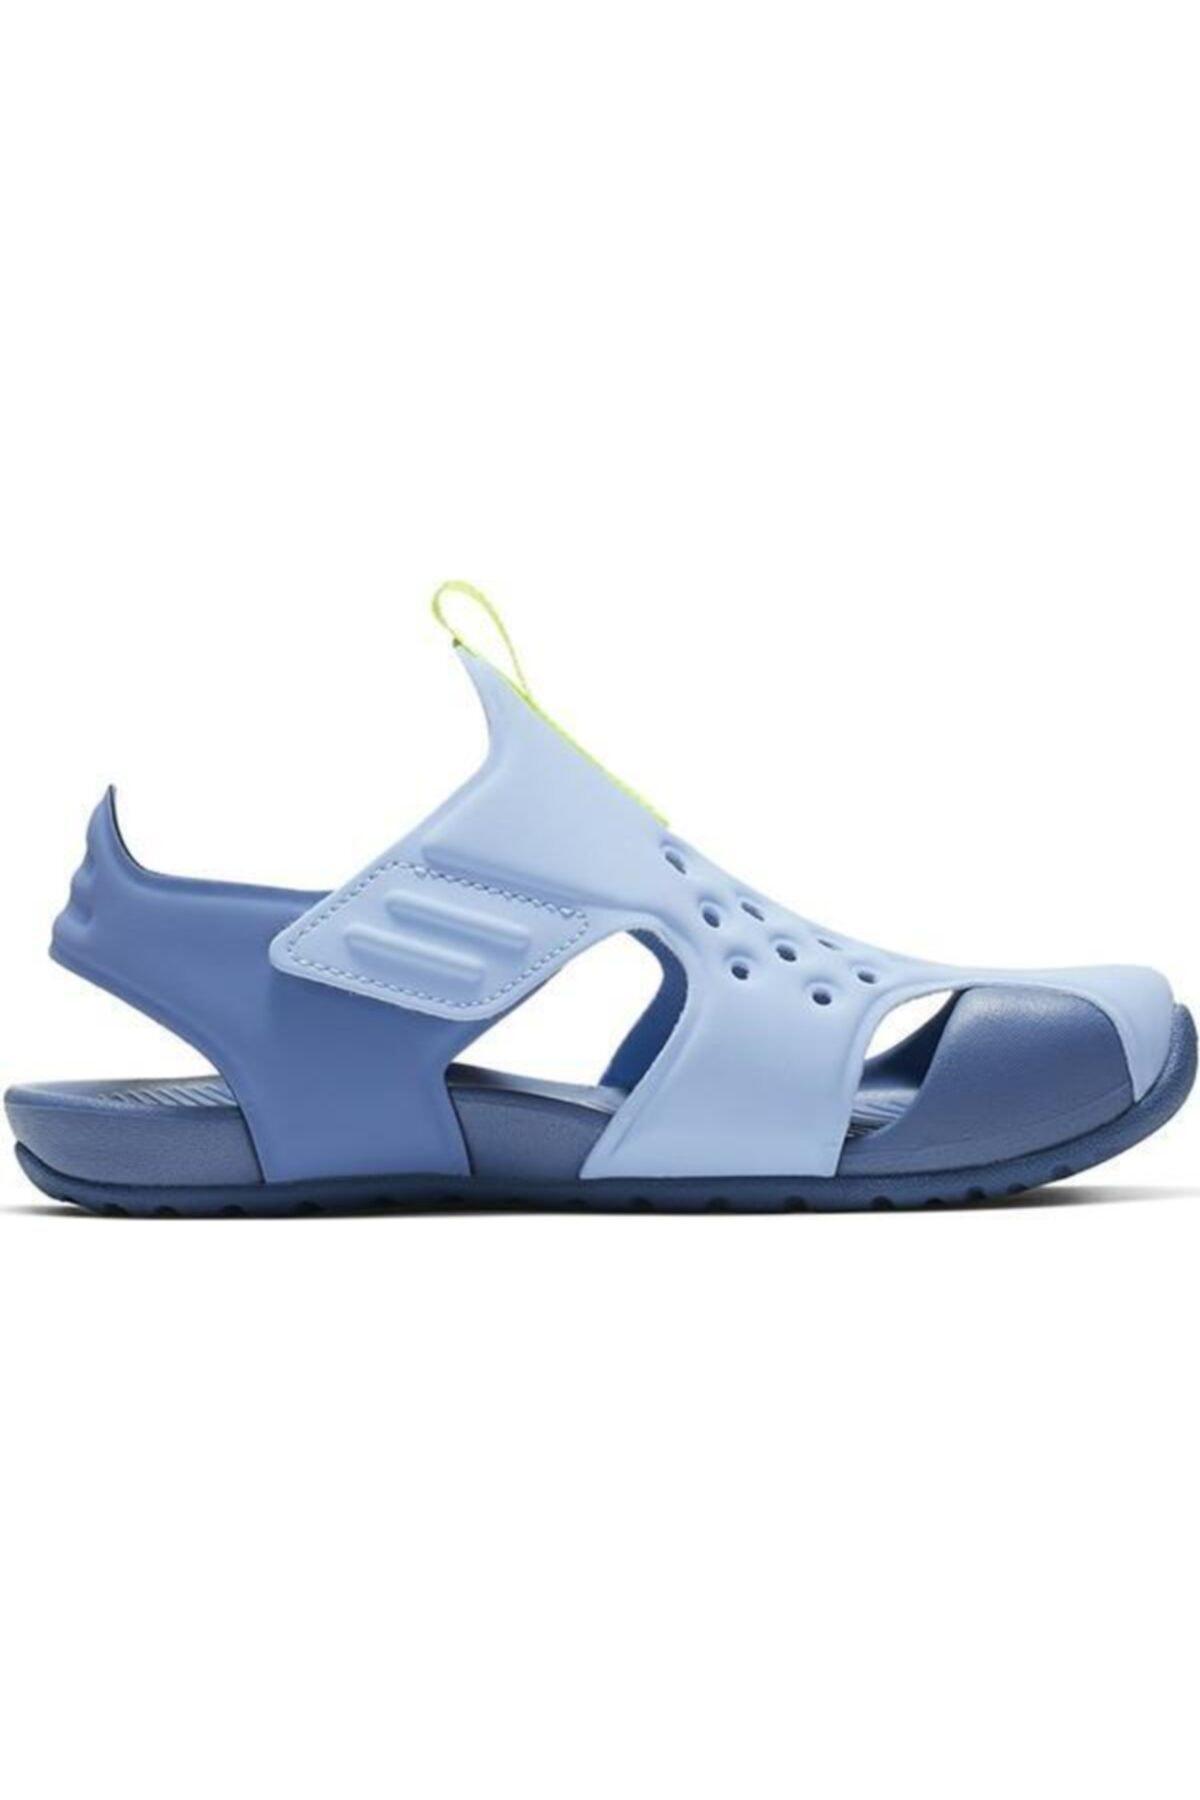 Nike Sunray Protect Çocuk Sandalet 943826 401 1